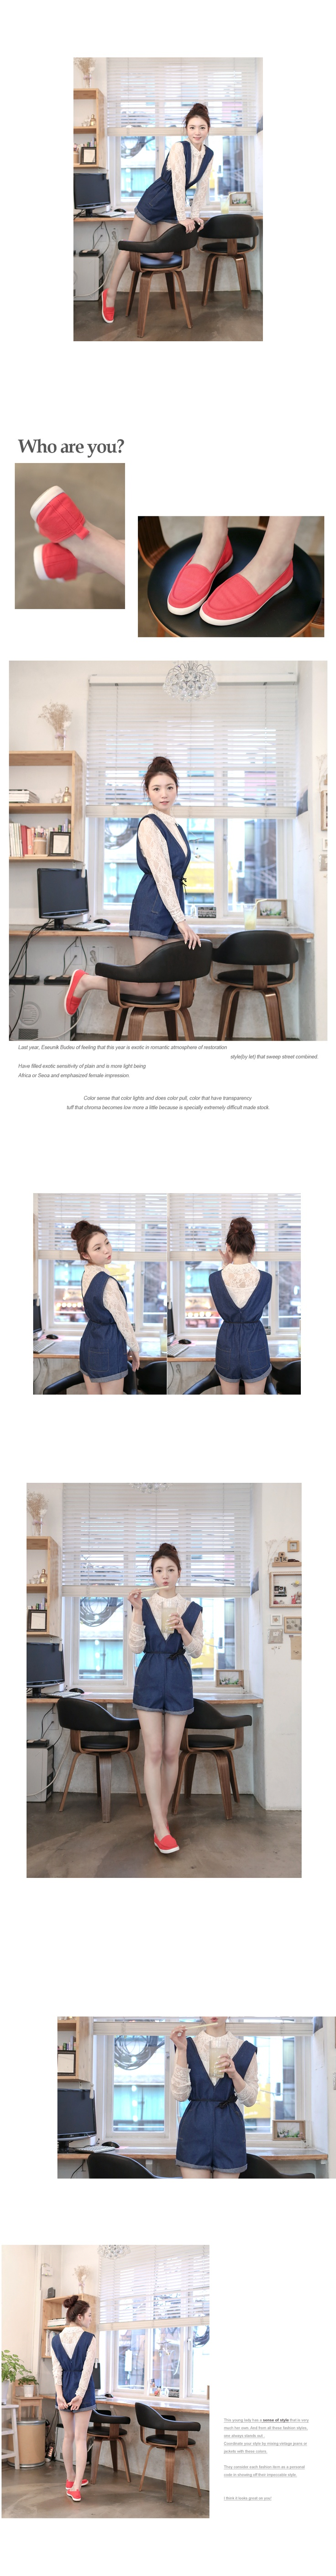 Jual jeans Korea Buy Sell Authentic Korean Skirt Fashion Online Sugarfun Skinny Jeans LFBTM_078_1258 $136 #malaysianbabes #malaysianshopper #malaysiashopper #malaysiashopping #malaysianshopping #onlineshop #onlineshopping #sggirls #koreafashion #koreanfashion #fashion #pikomiko #shoppingspree #spree #poslaju #posmalaysia #malaysiashop